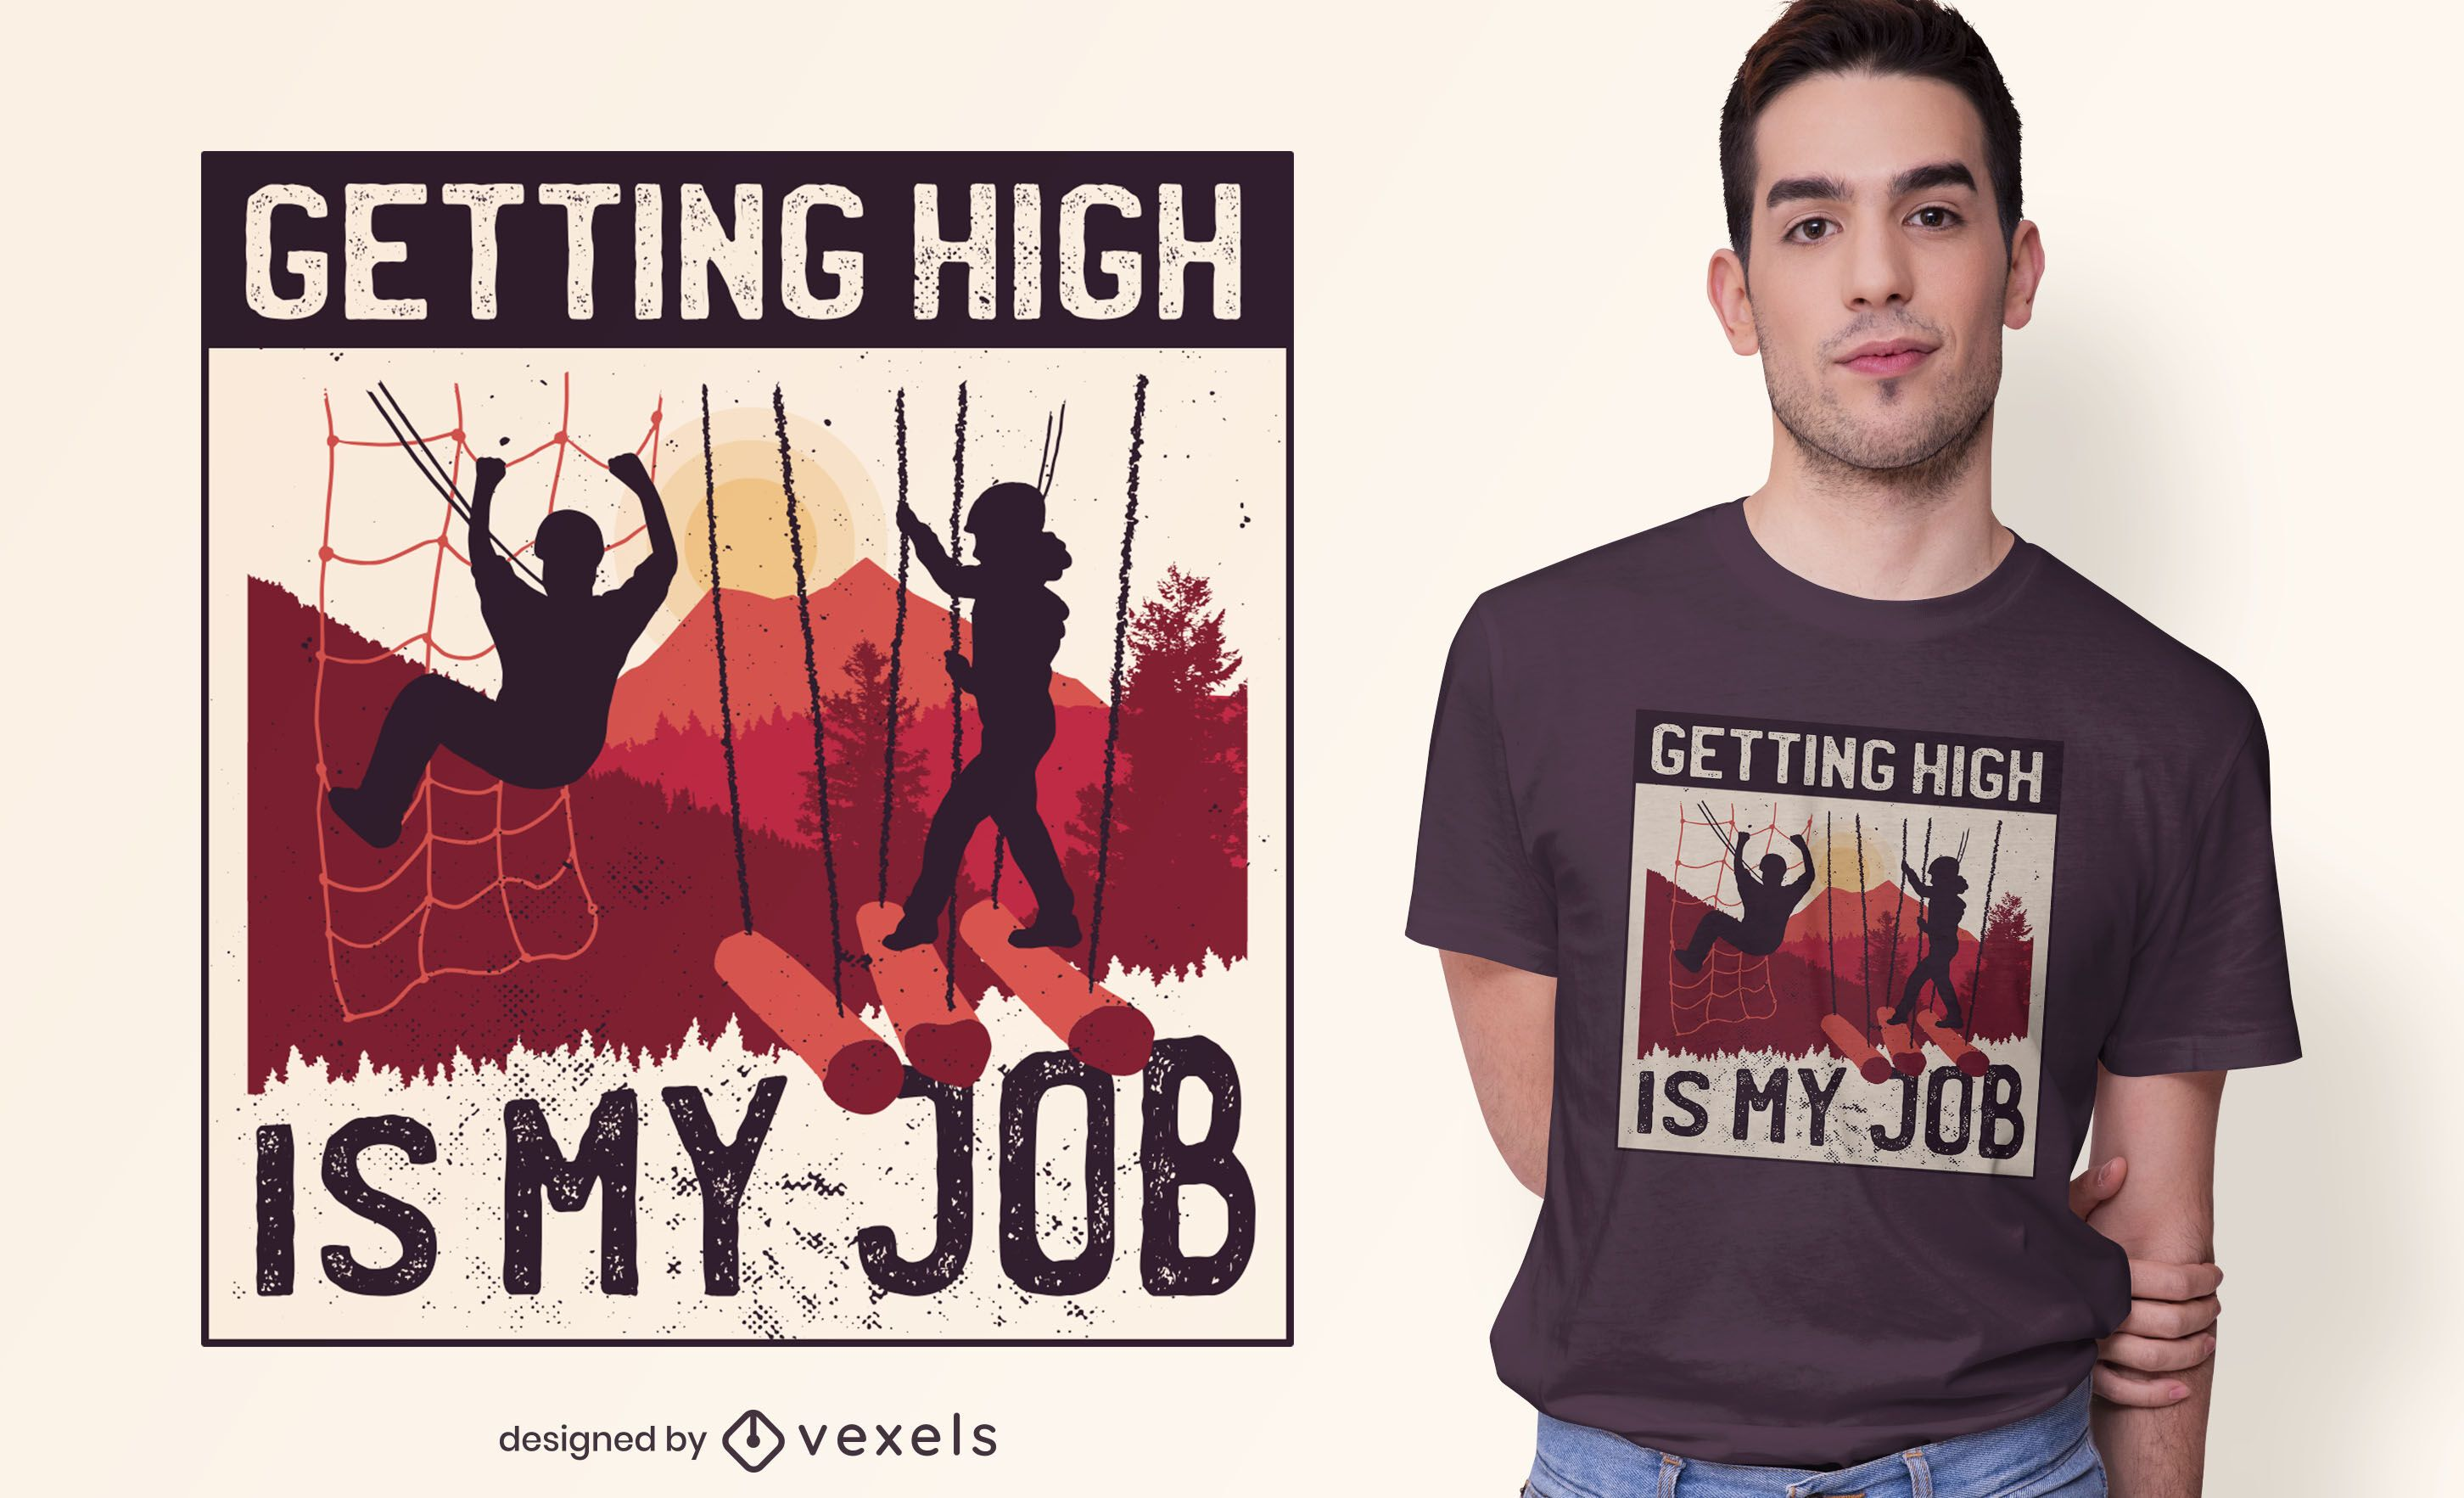 Getting high t-shirt design